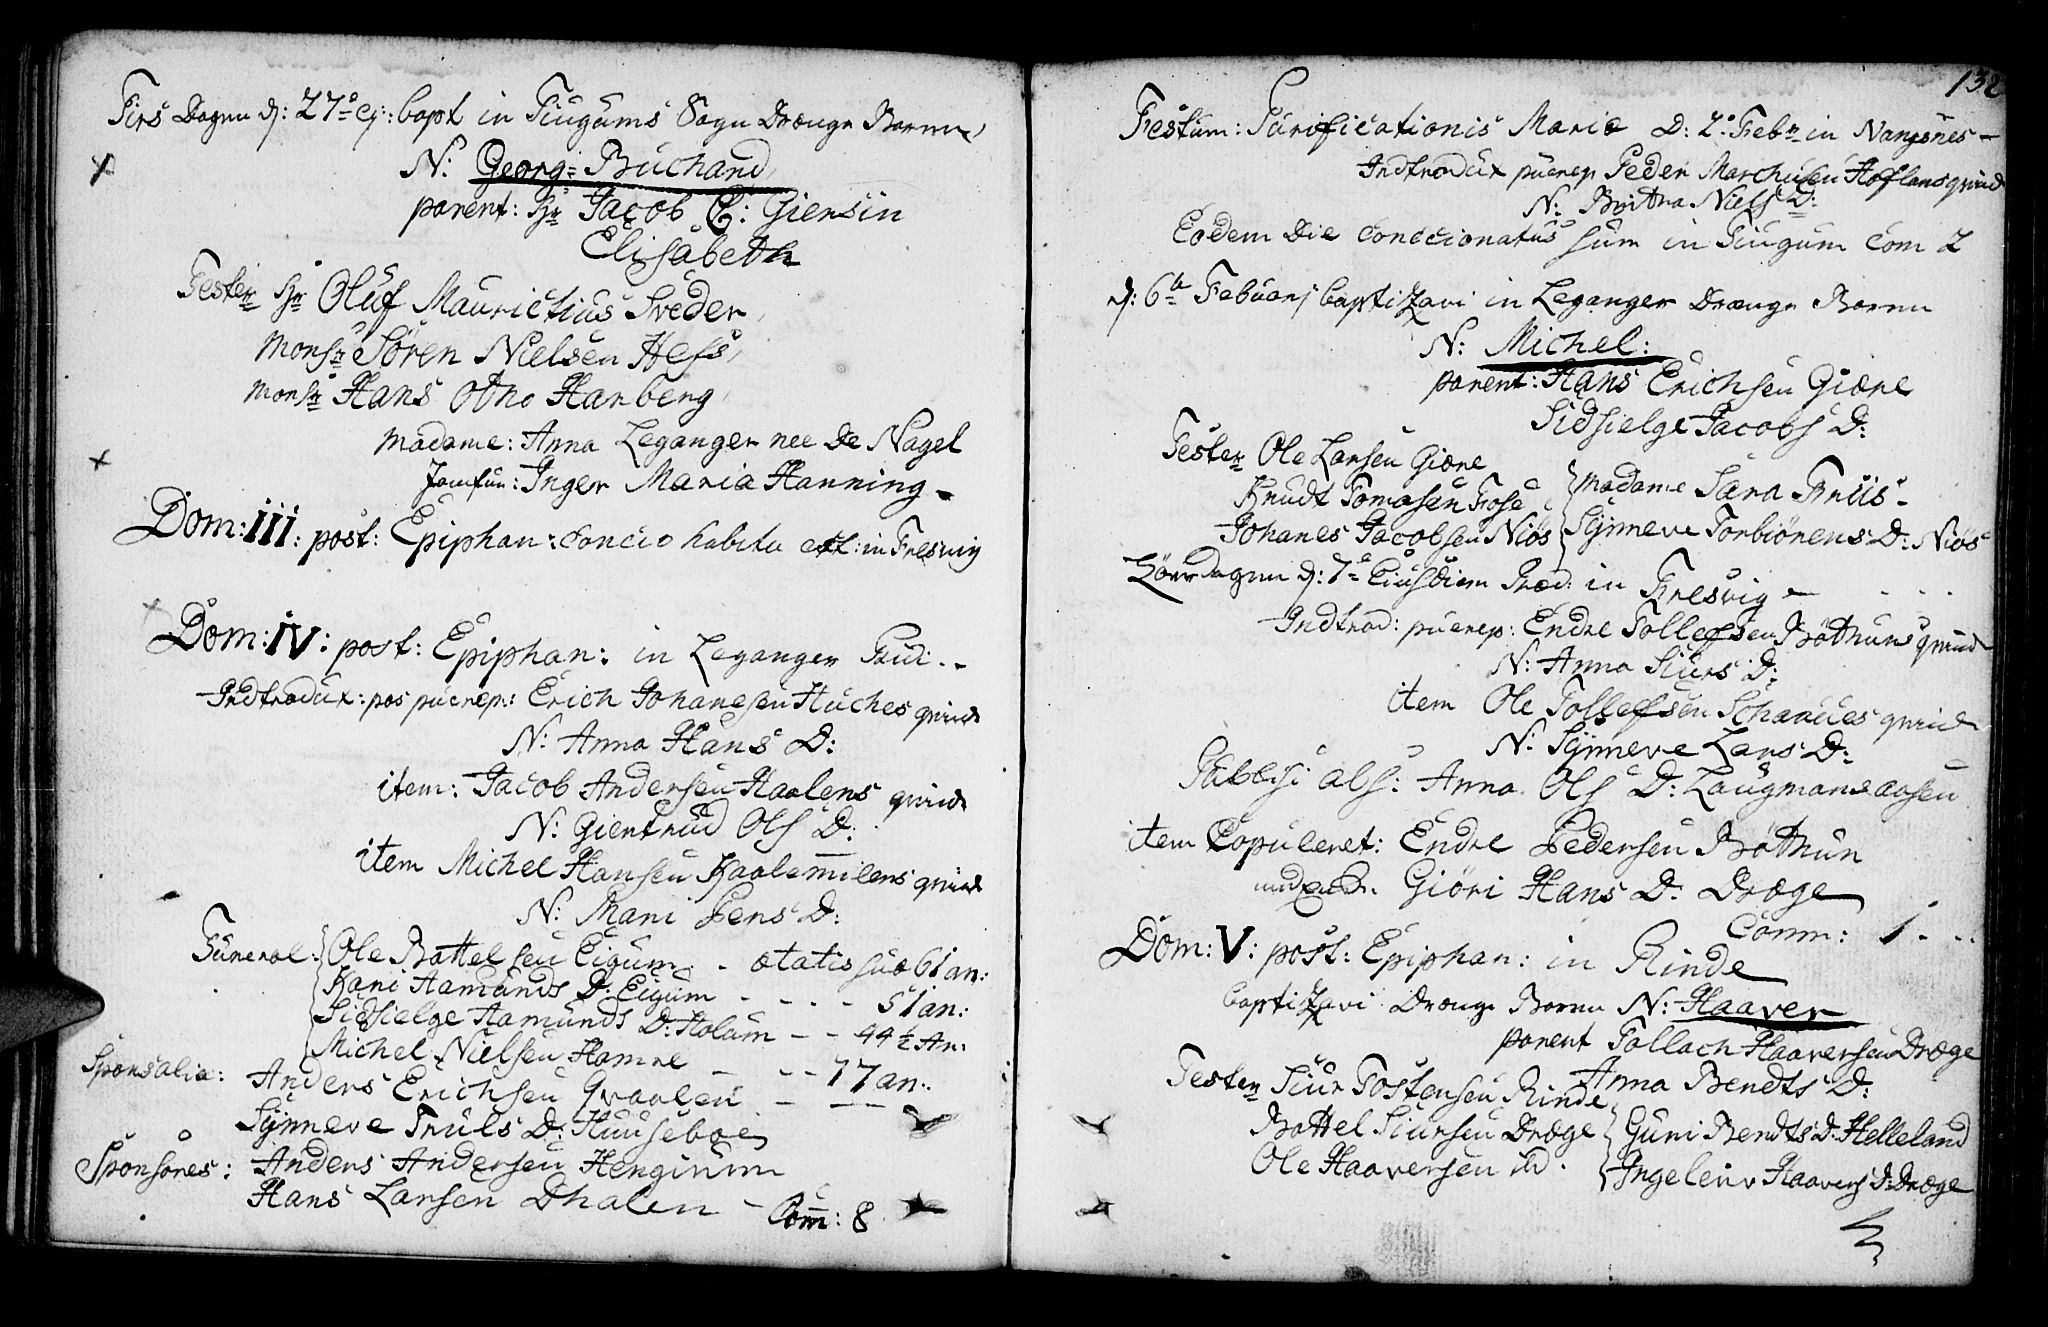 SAB, Leikanger Sokneprestembete, Ministerialbok nr. A 3, 1756-1770, s. 132